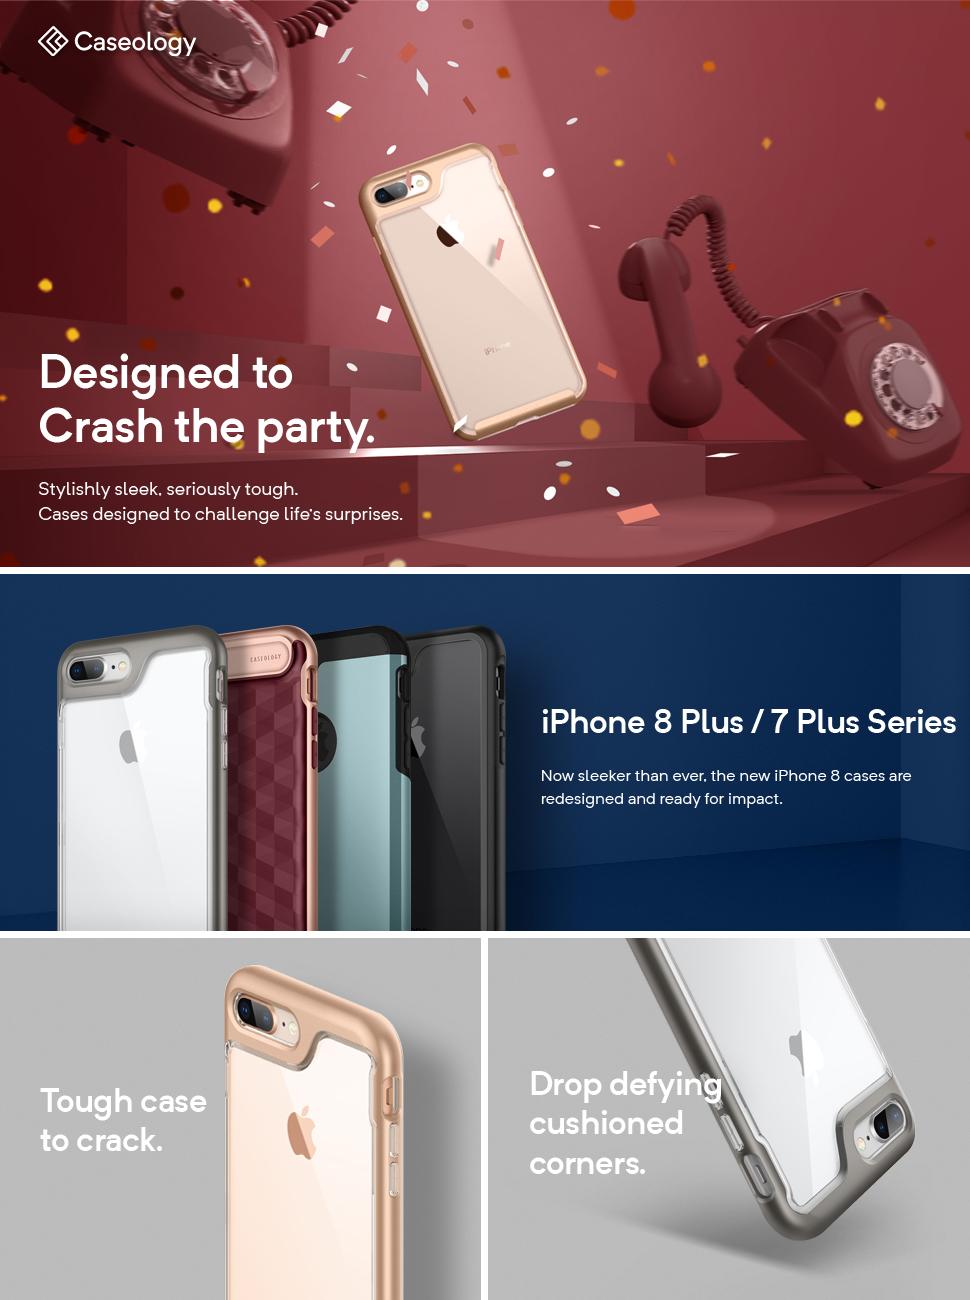 iphone 8 plus case jetech